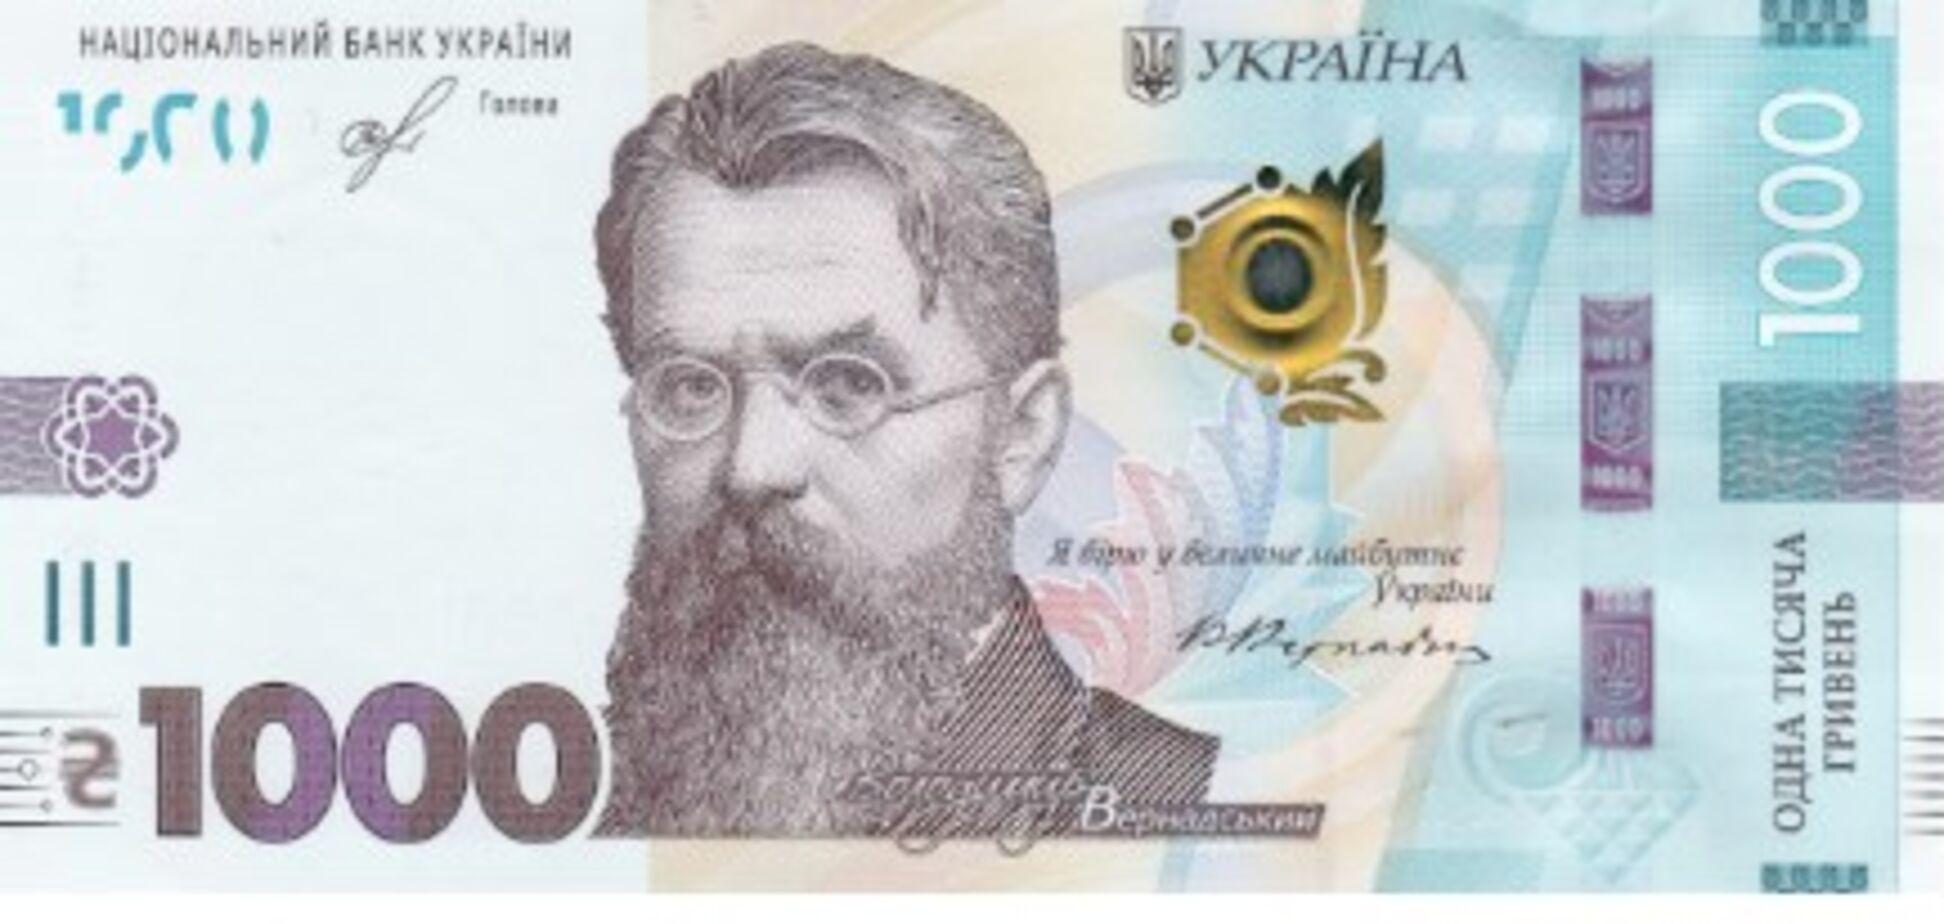 Купюра в 1000 гривен поборется за звание банкноты года: фото всех претендентов